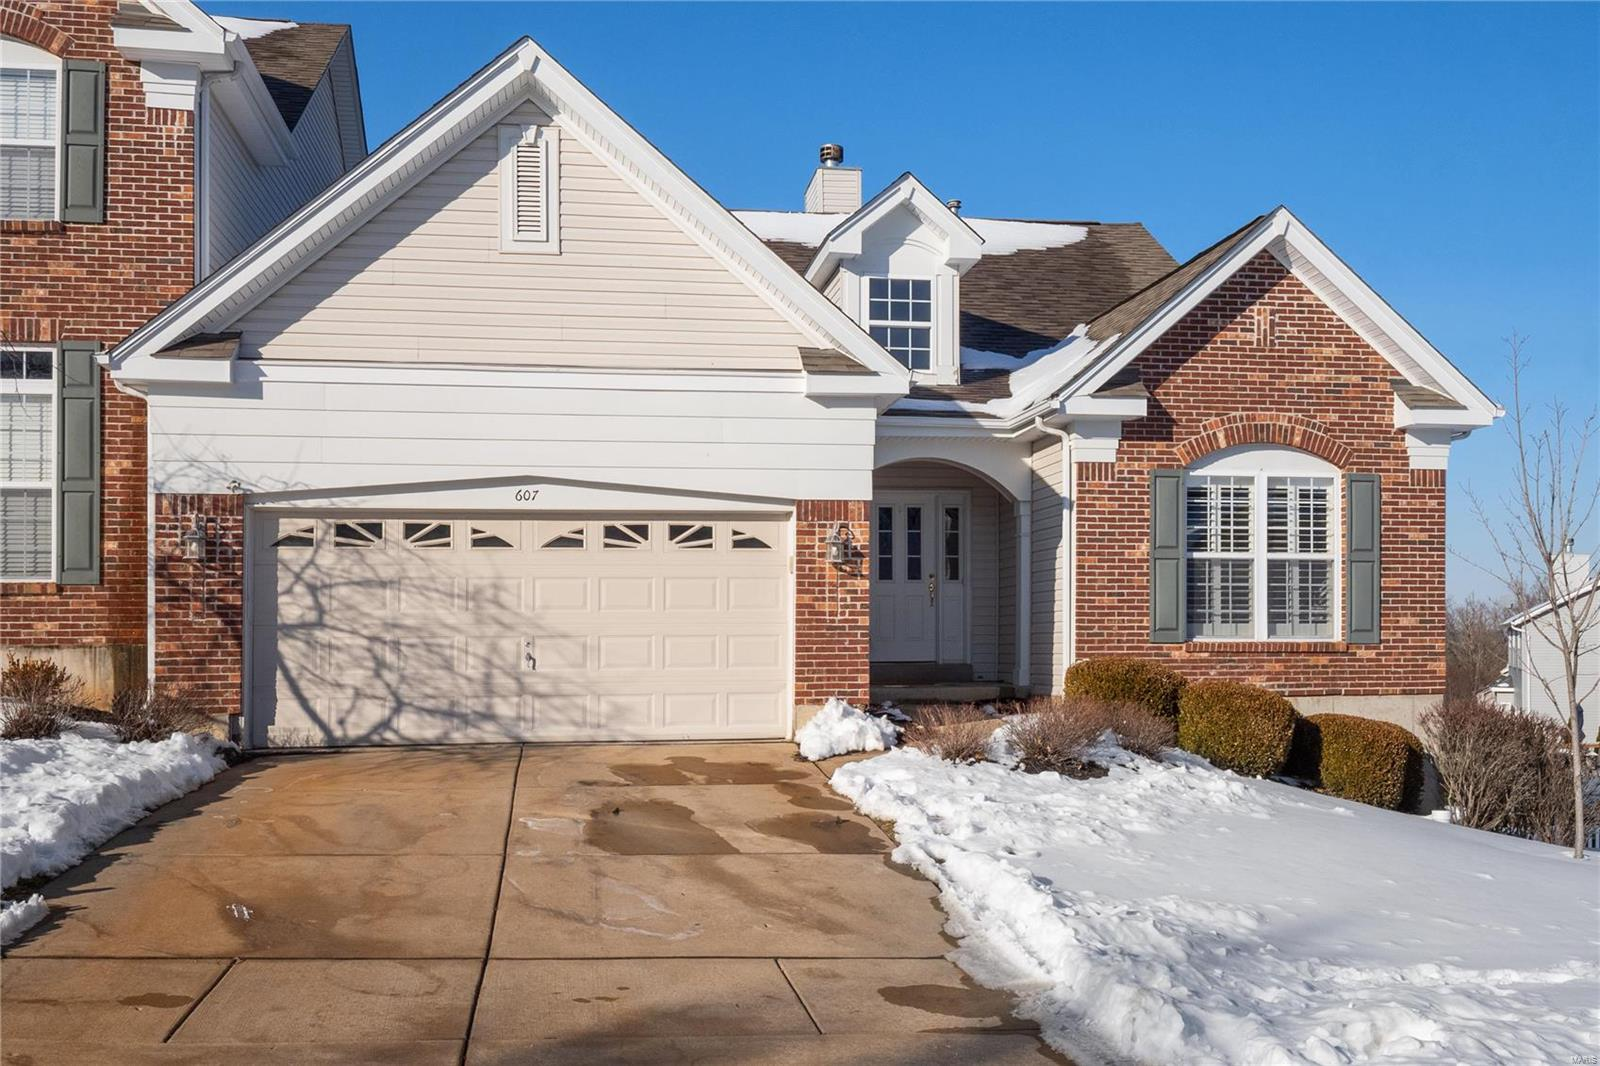 607 Bluffs View Property Photo - Eureka, MO real estate listing